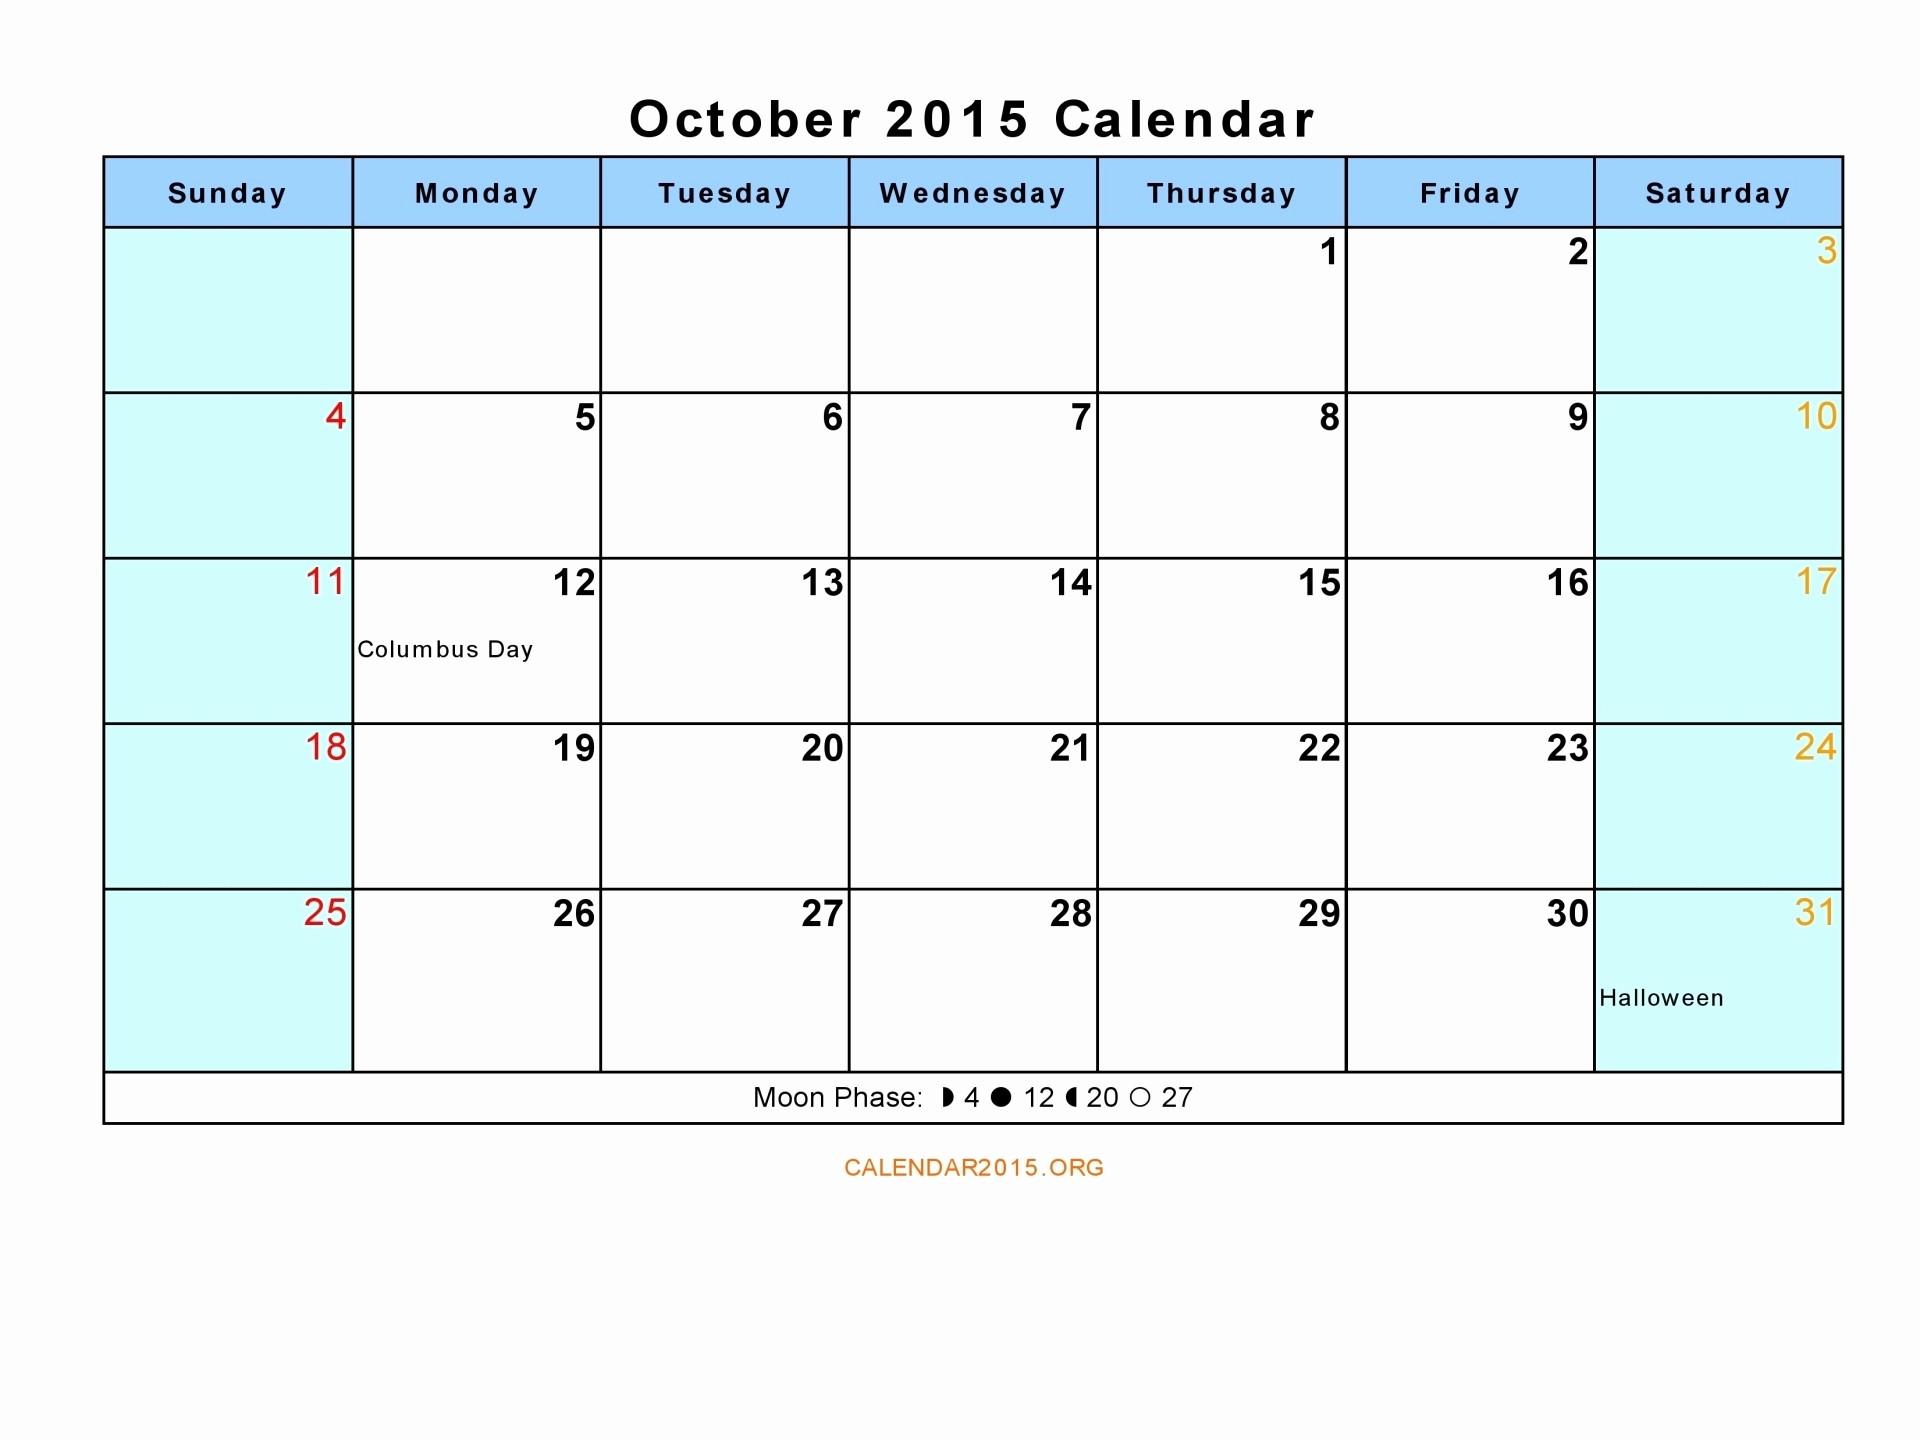 Calendar 2015 Printable with Holidays Beautiful Free 2015 Printable Calendar Template with Holidays